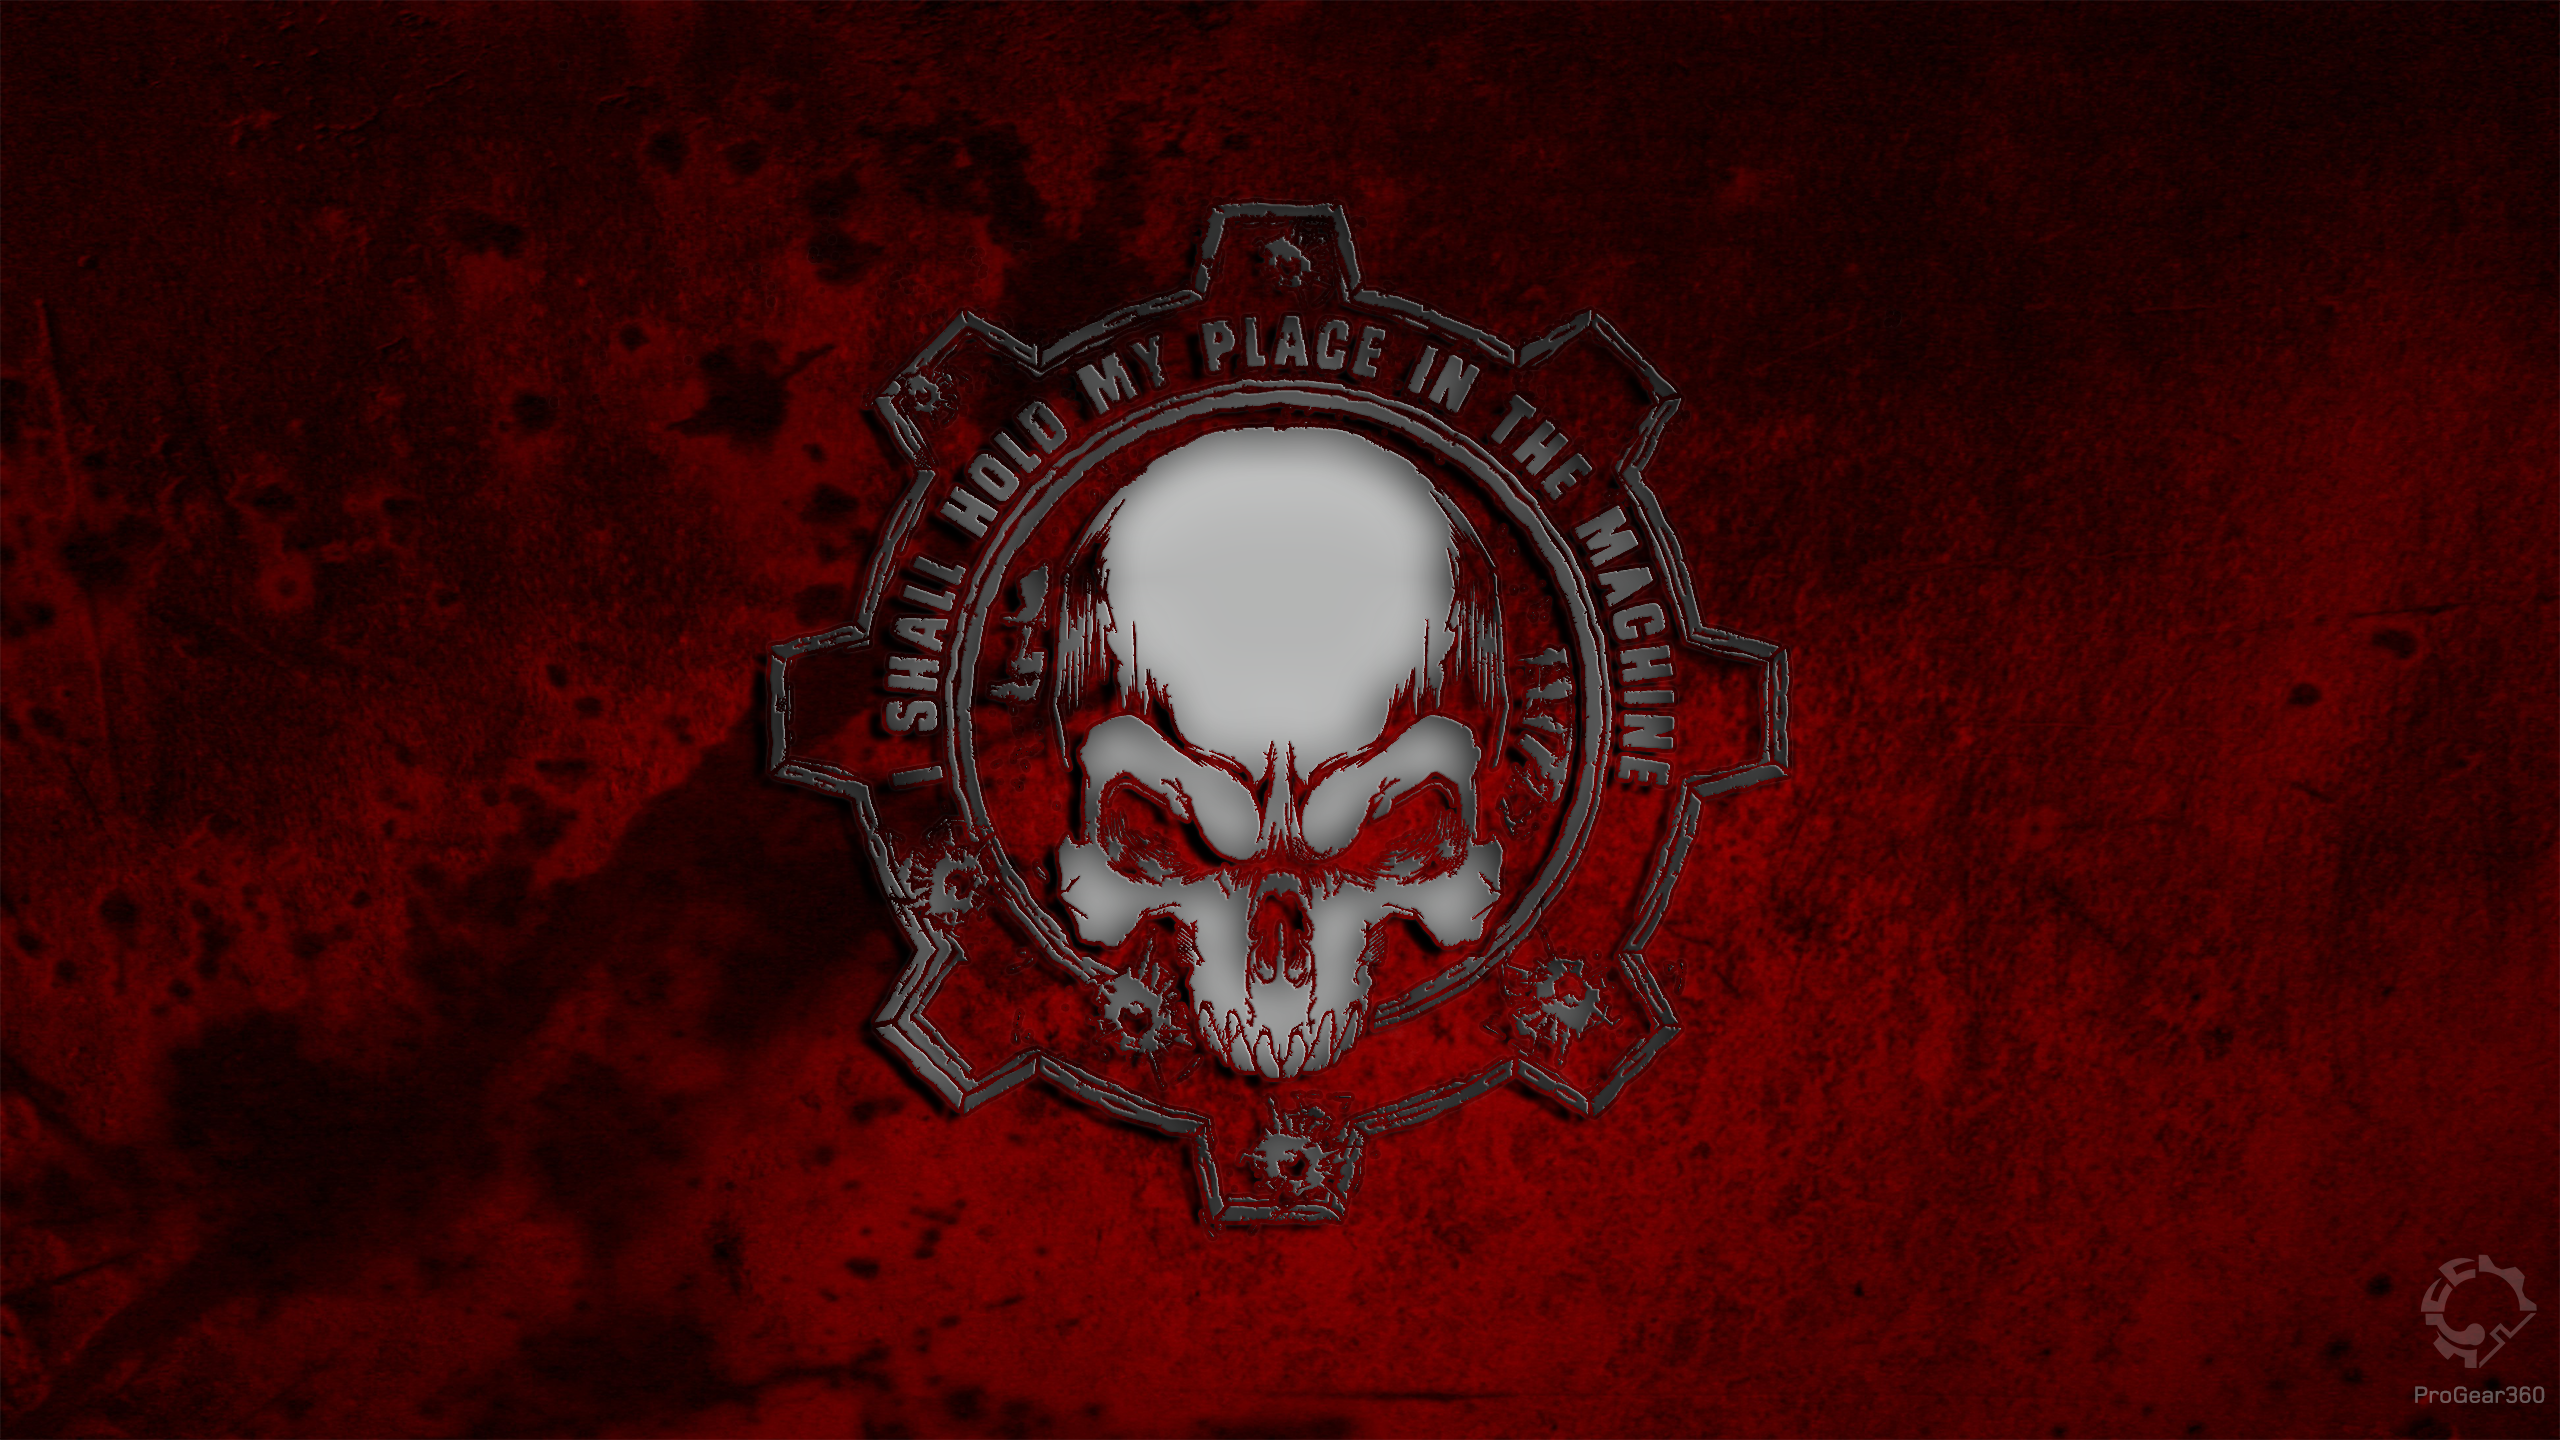 Gears Of War 4 Wallpapers 1080p Click Wallpapers Gears Of War Wallpaper War